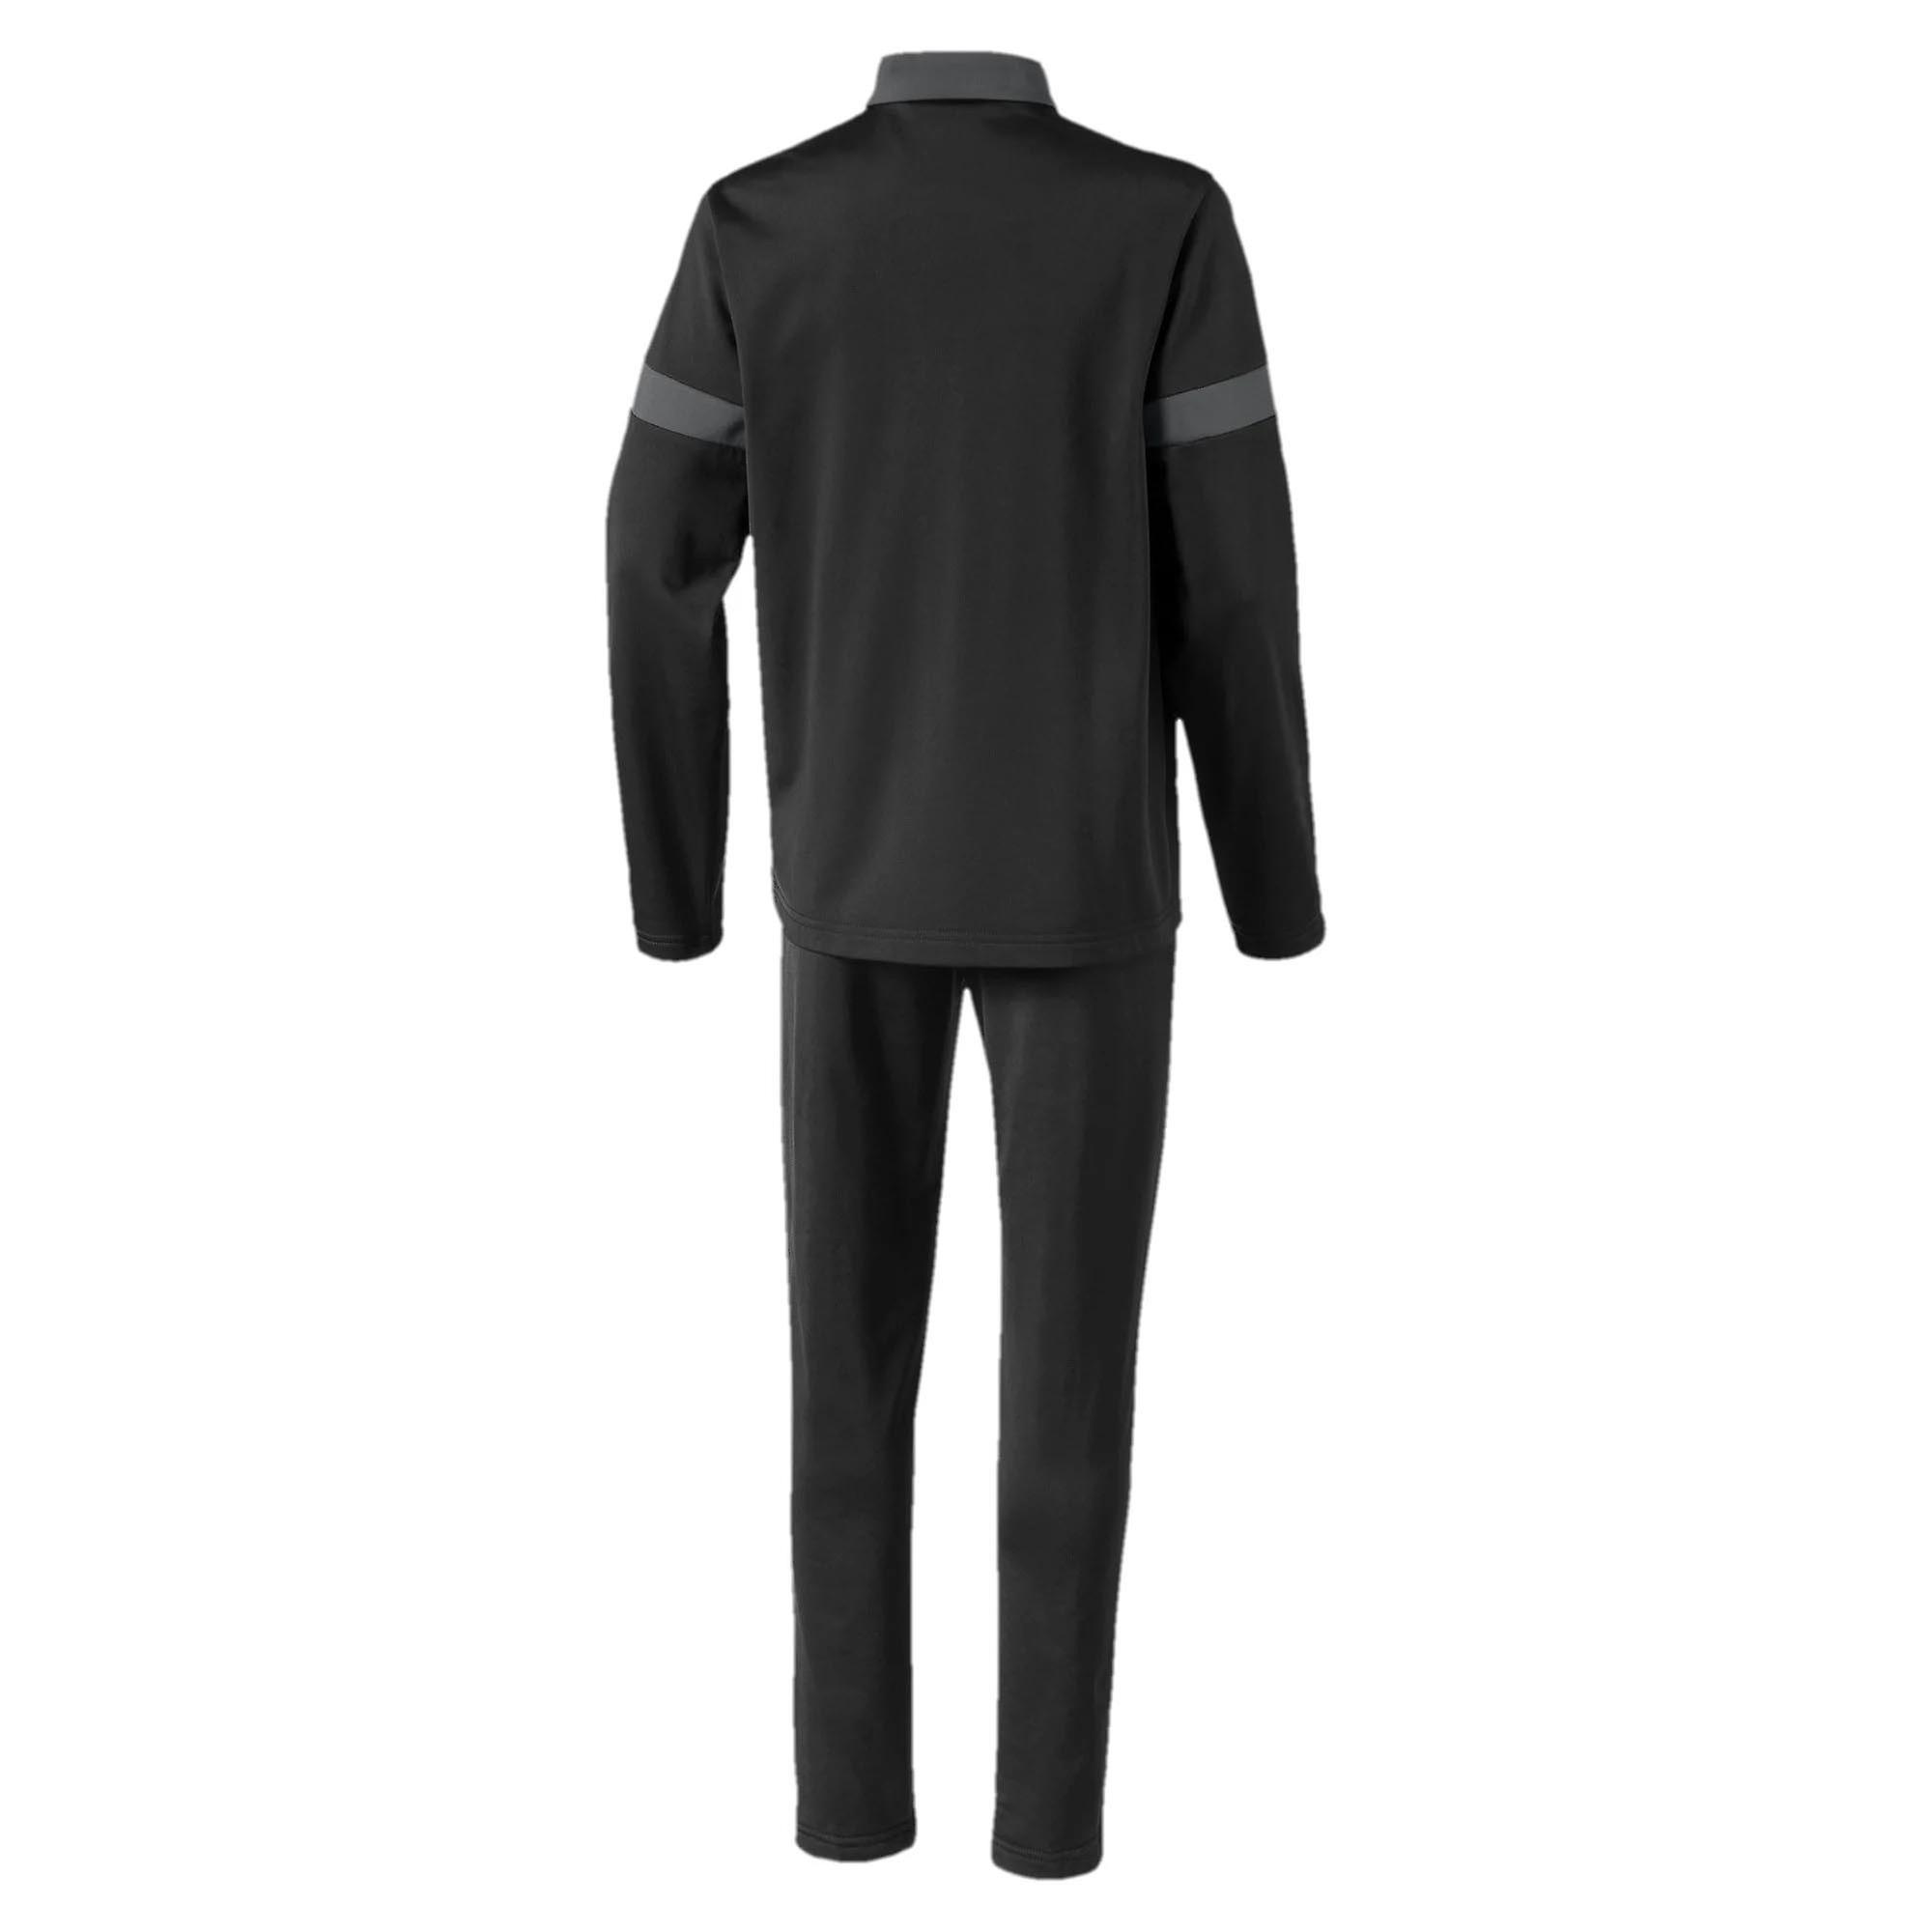 Puma FtblPLAY Kids Football Fitness Training Sports Tracksuit Set Black/Grey